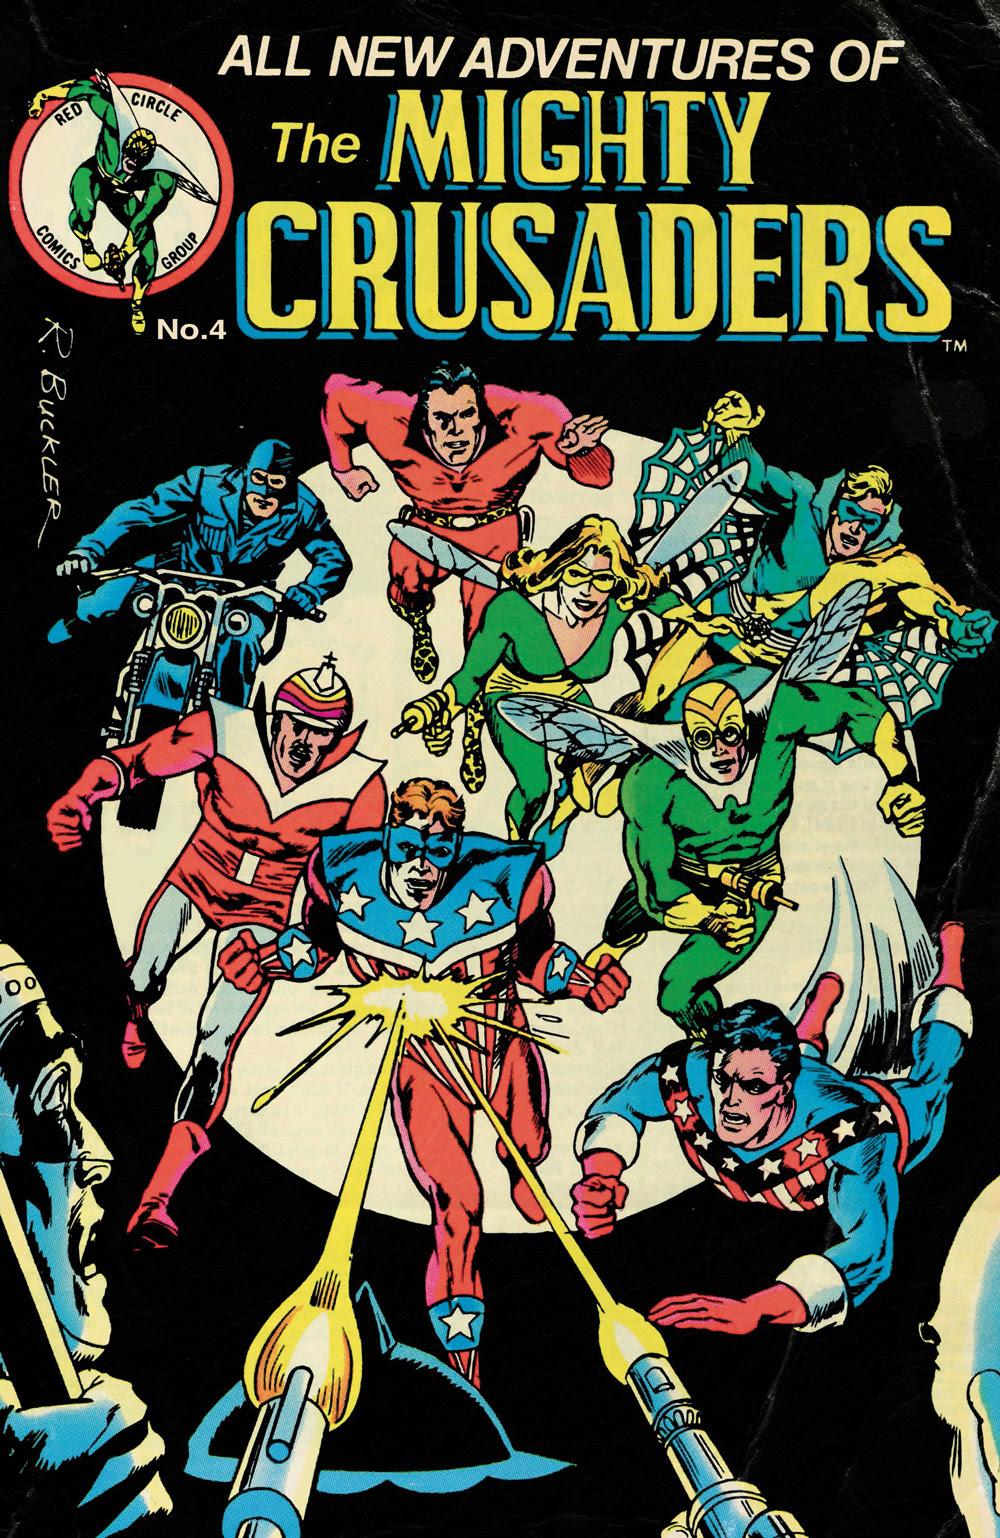 The Mighty Crusaders #4 CVR B: Throwback